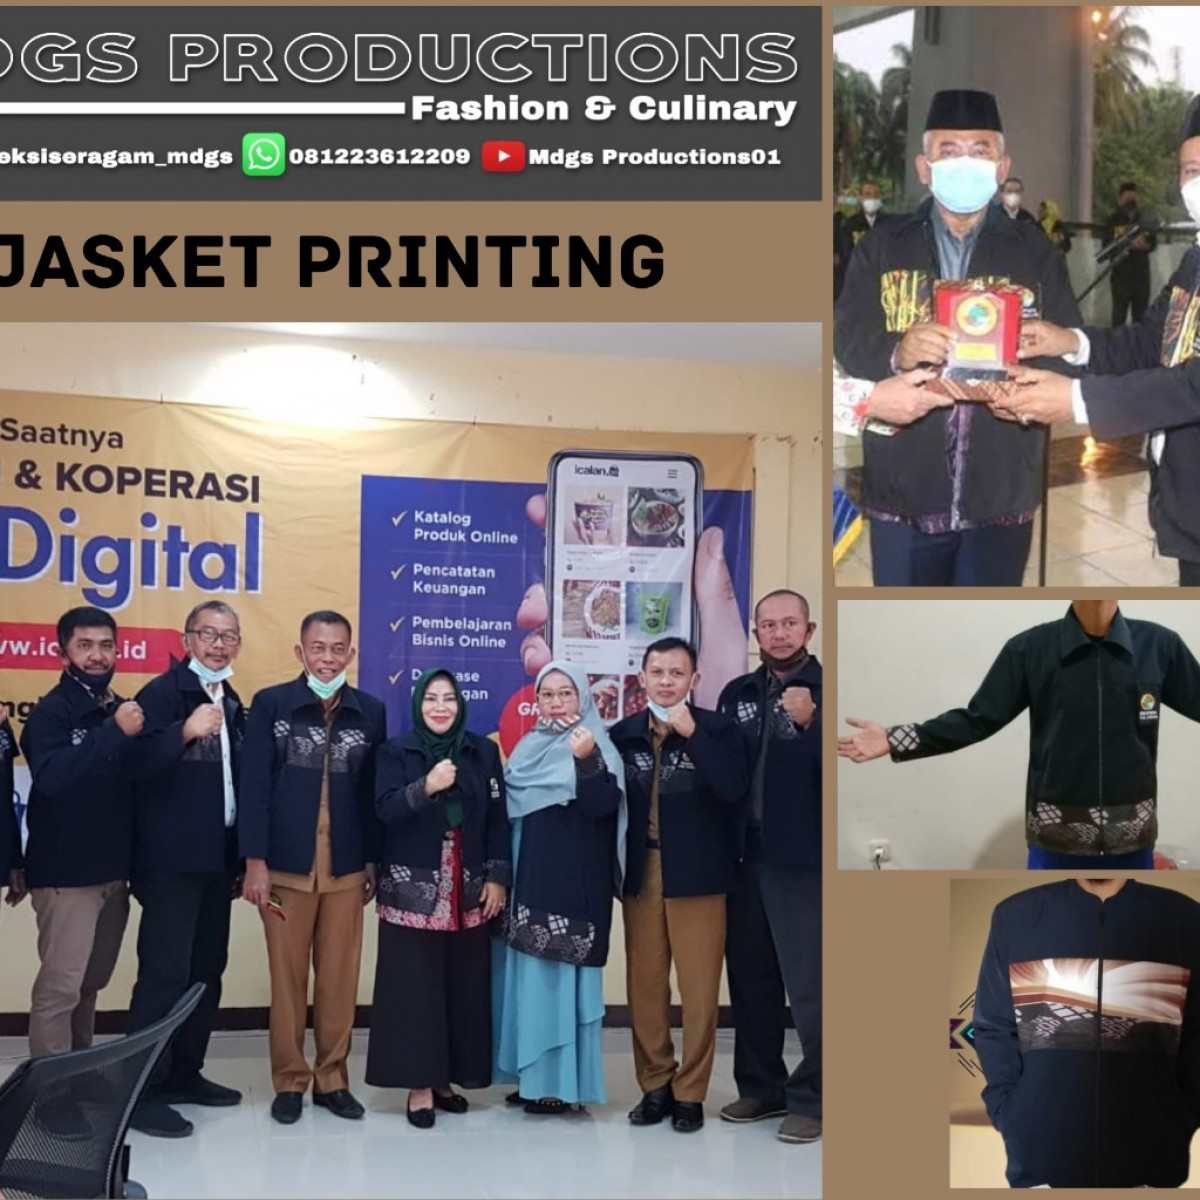 Jasket Printing